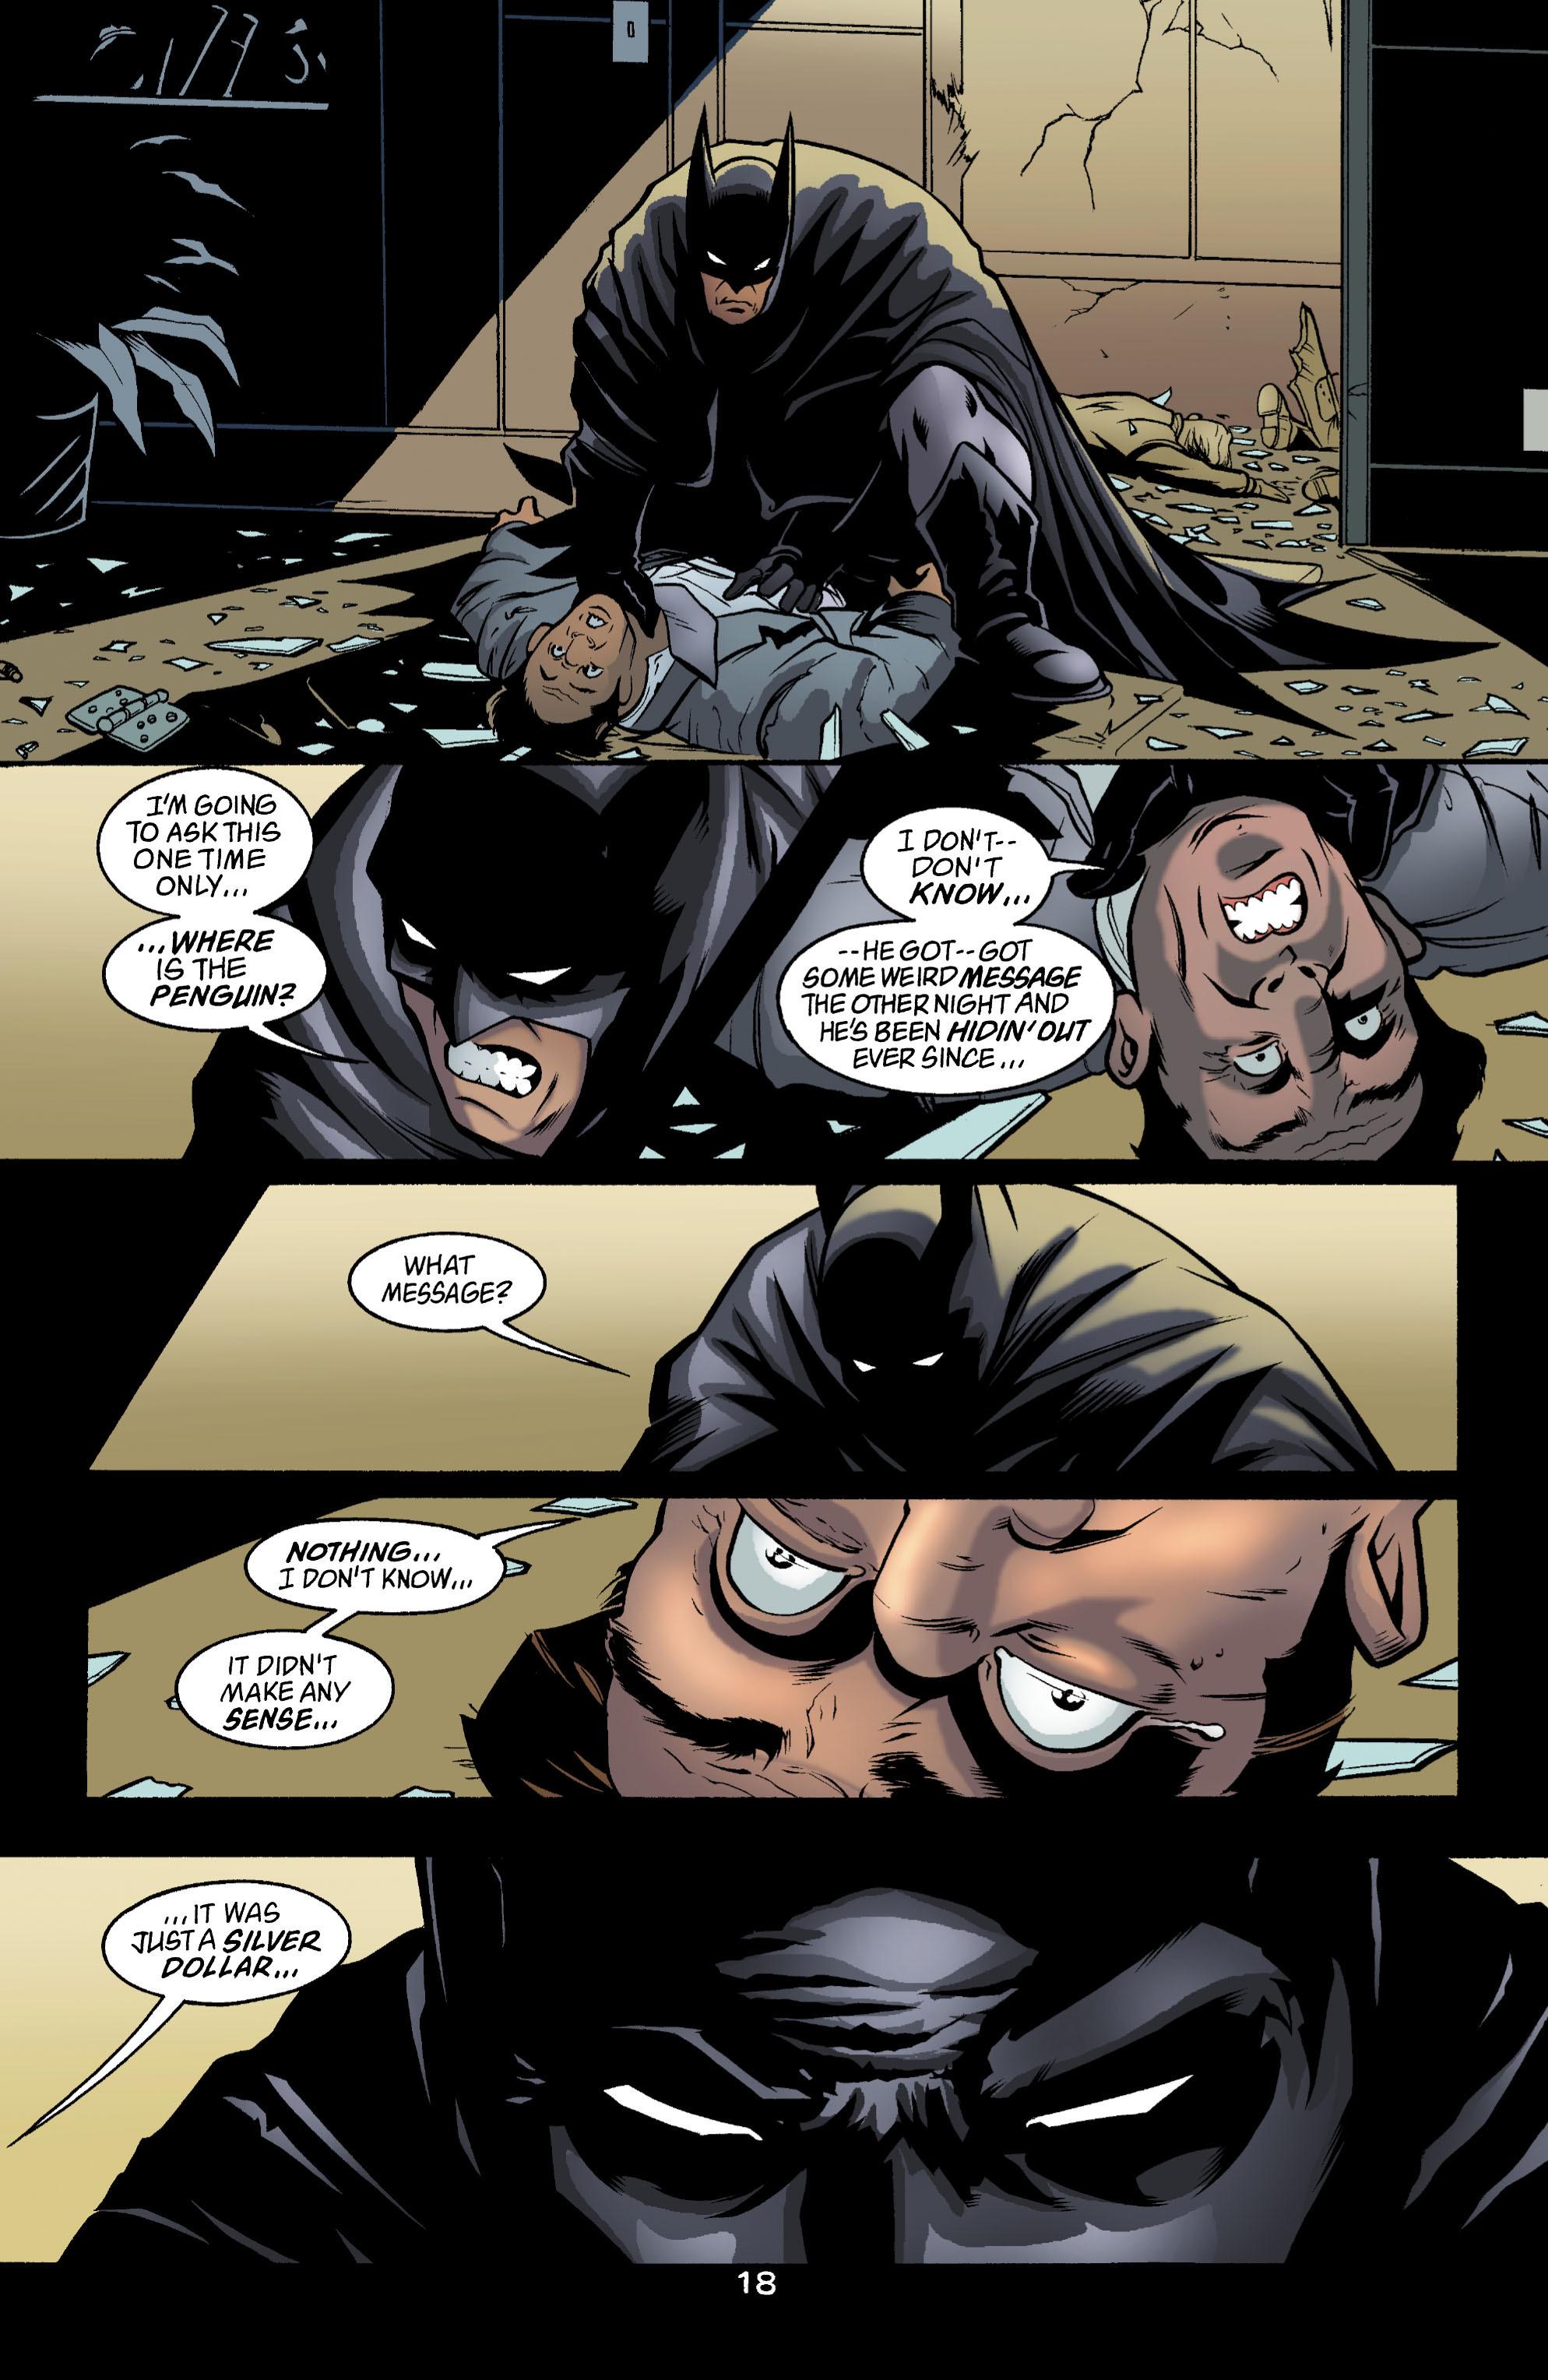 Detective Comics (1937) 778 Page 18